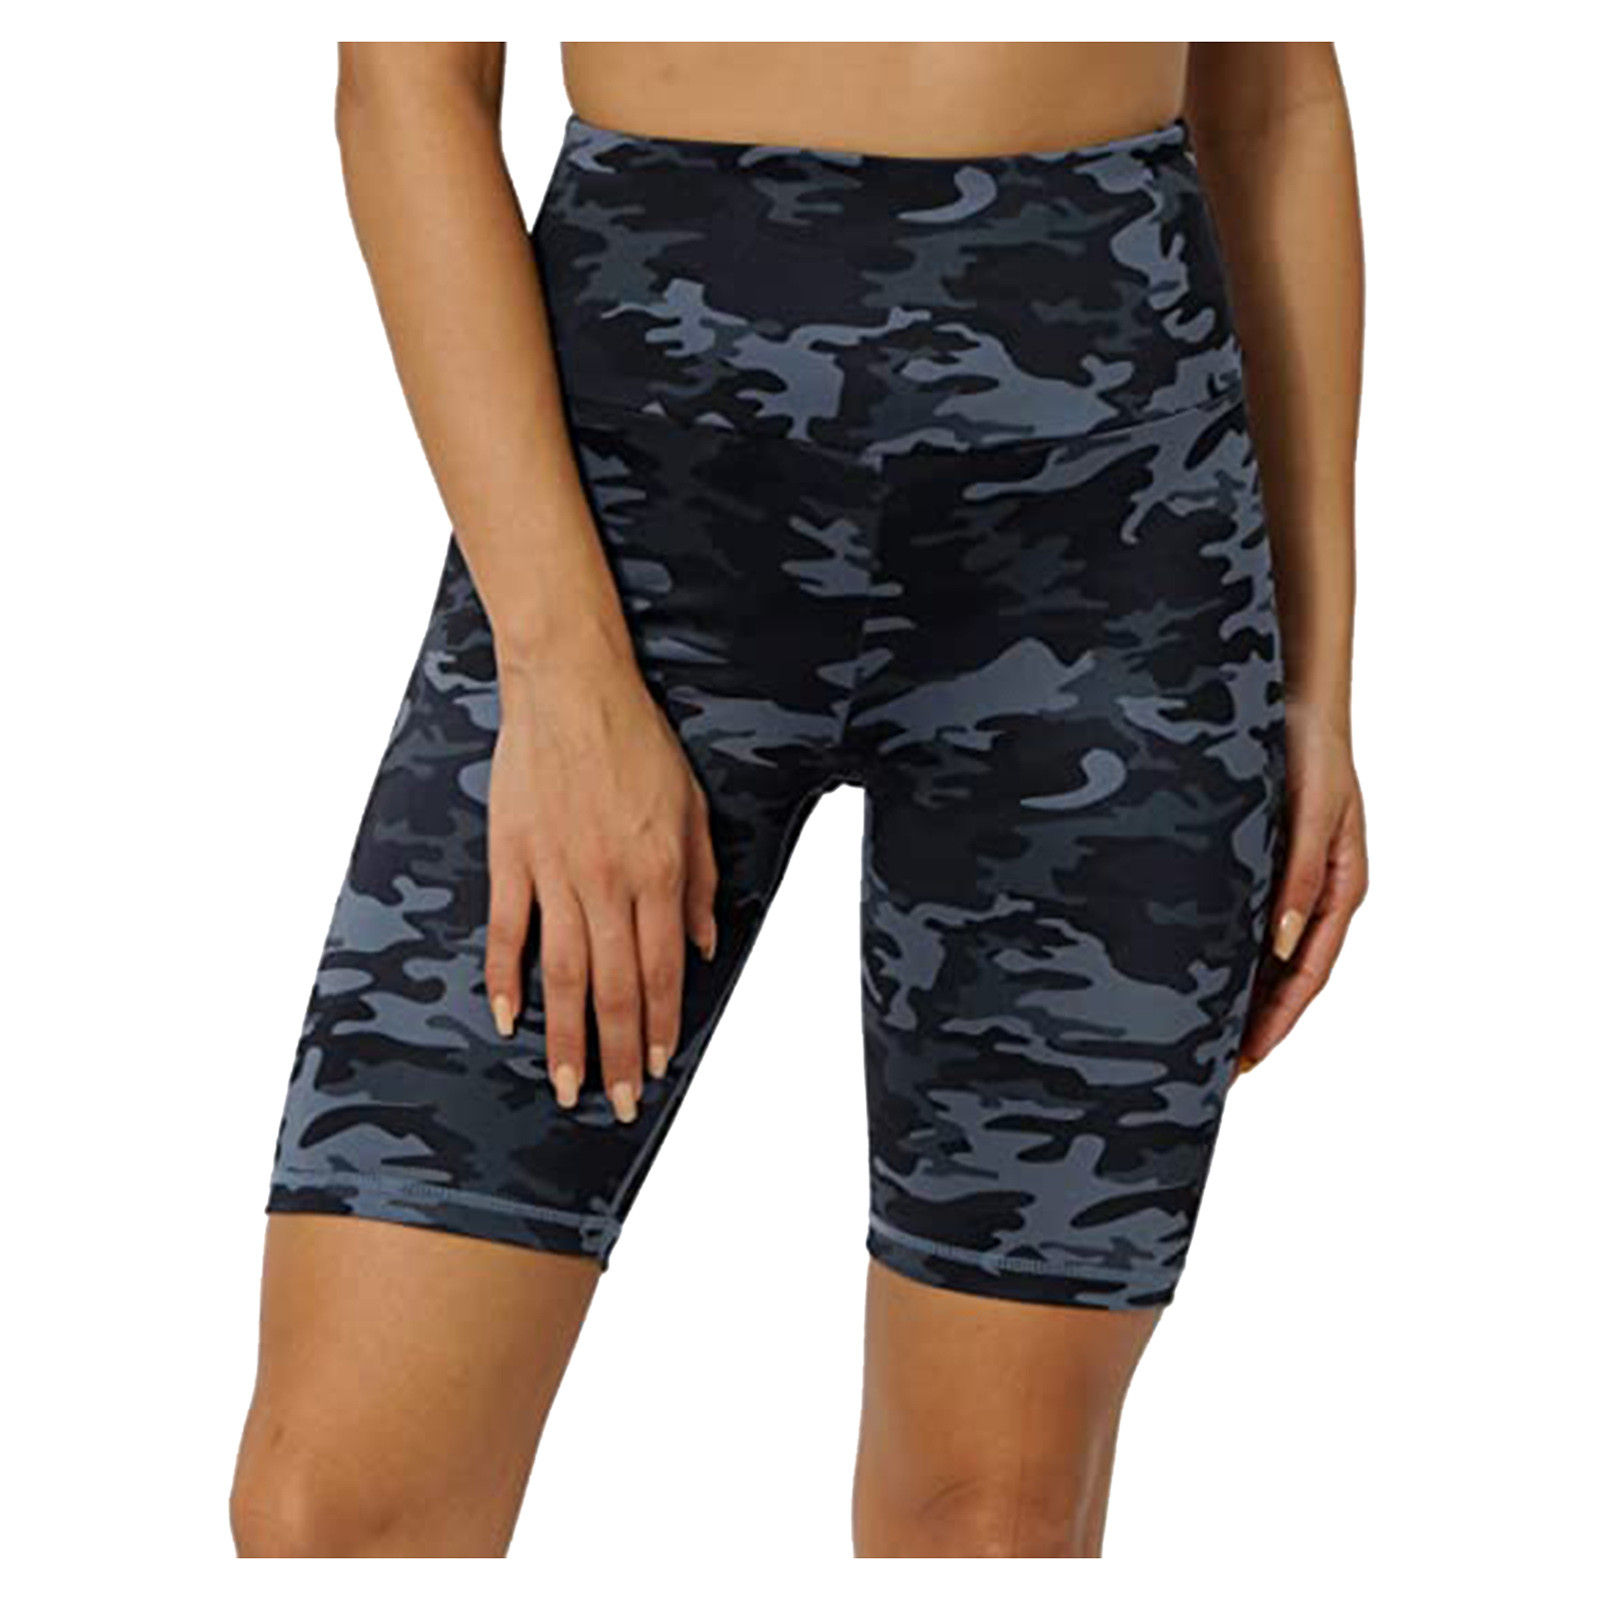 Femmes Leggings Camouflage impression jambières d'exercices poches cachées yo-ga pantalons courts femmes athlétique Leggins jambes Ropa De Mujer